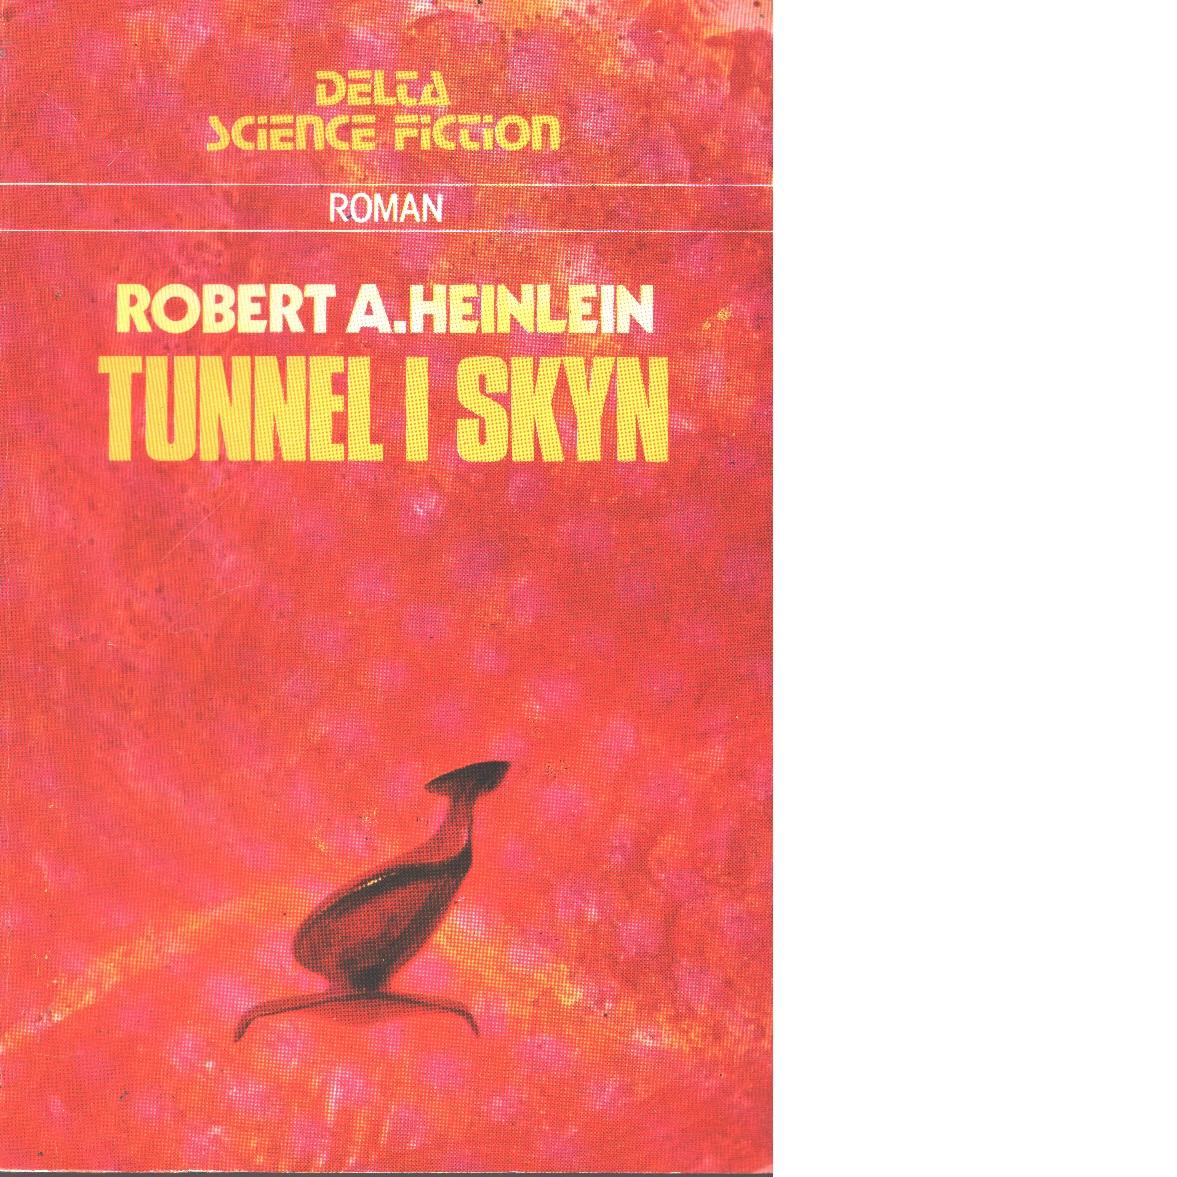 Tunnel i skyn - Heinlein, Robert A.